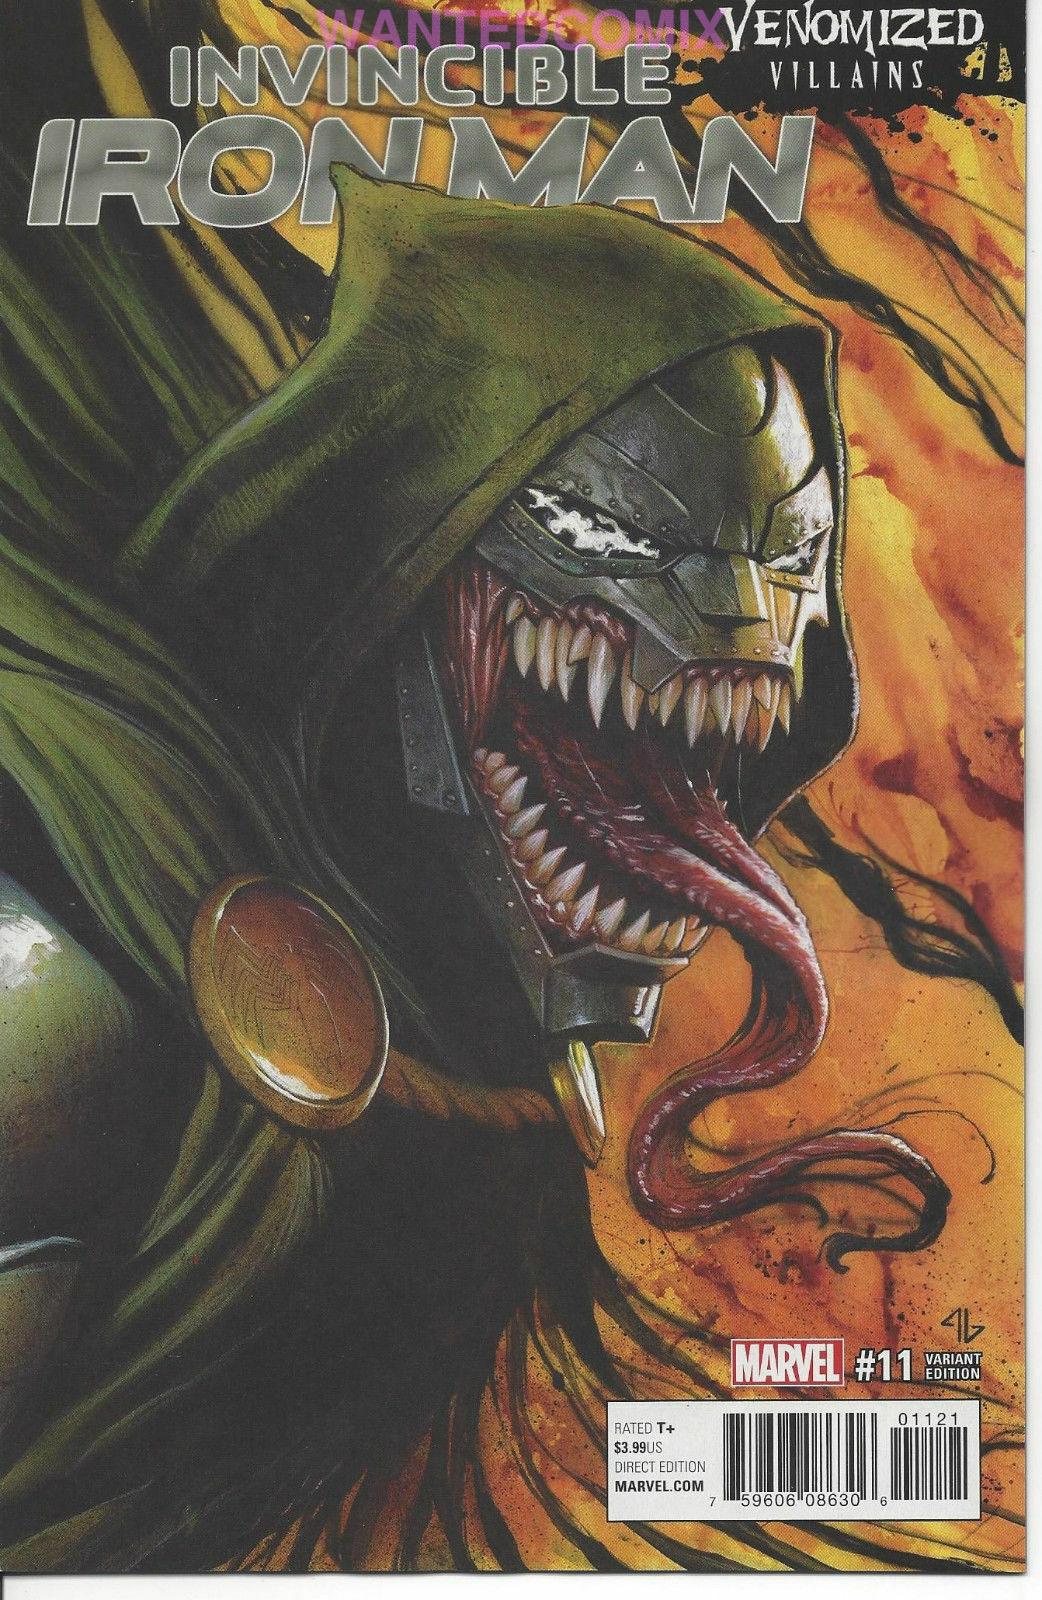 Invincible Iron Man #11 Venomized Variant Edition  Marvel Comics CB16510